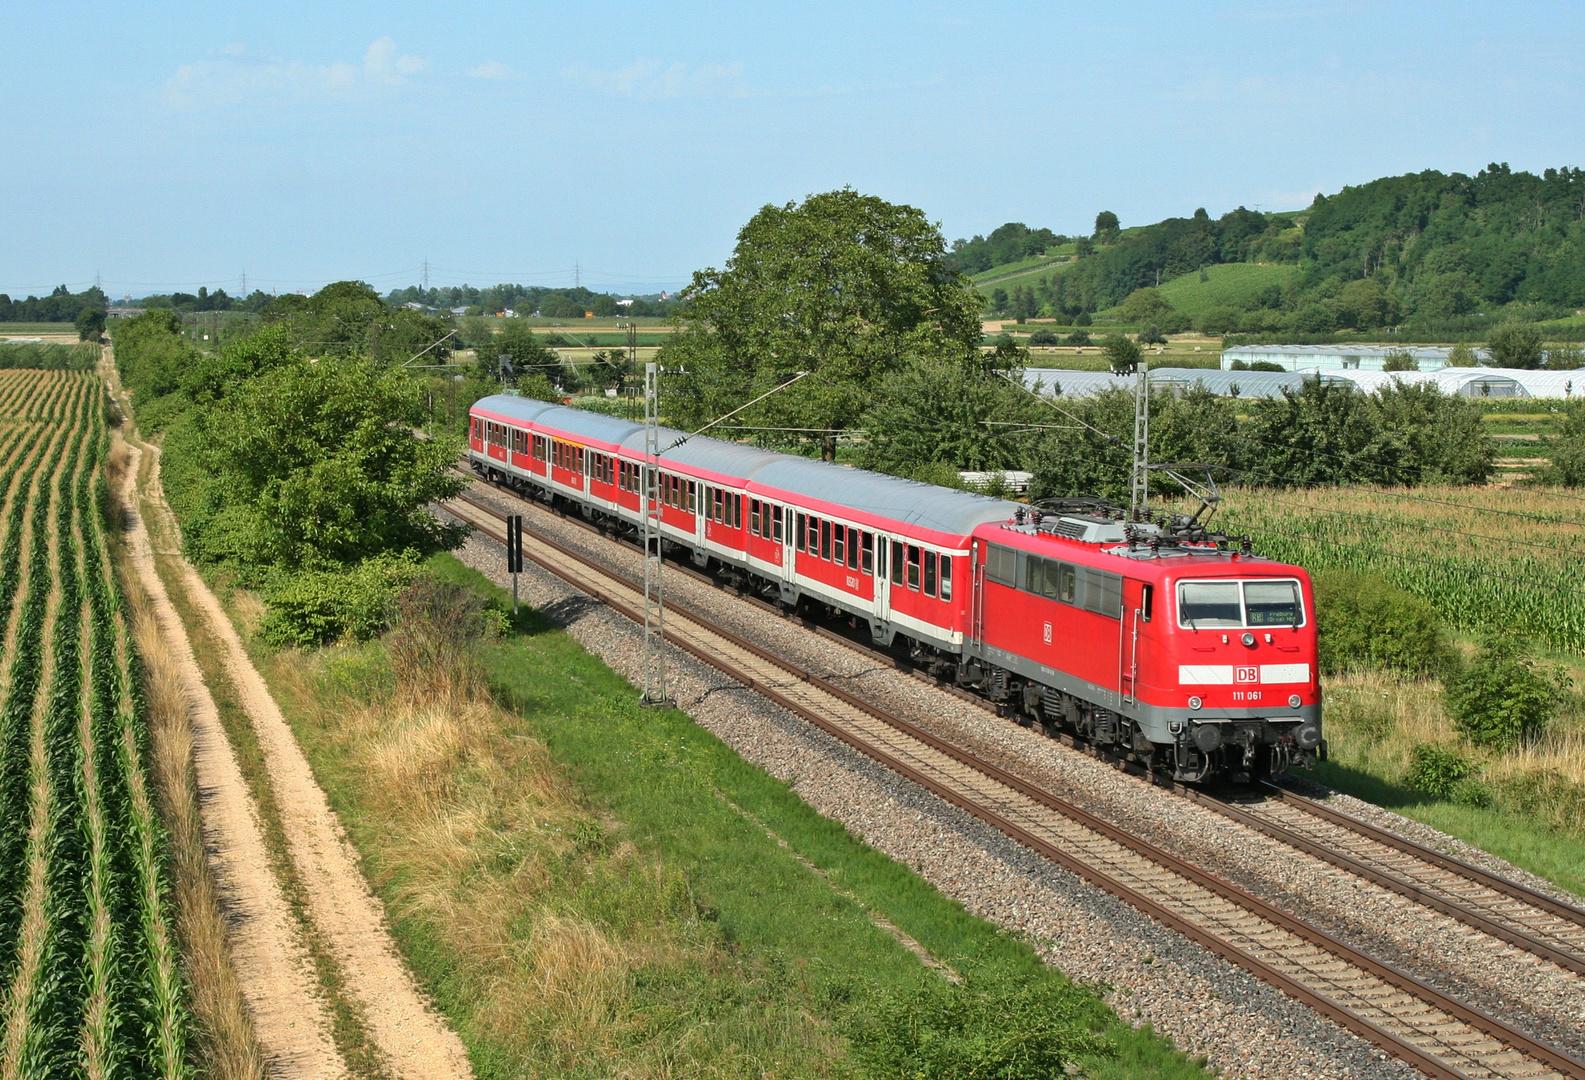 111 061 auf dem Weg nach Freiburg (Breisgau) Hbf